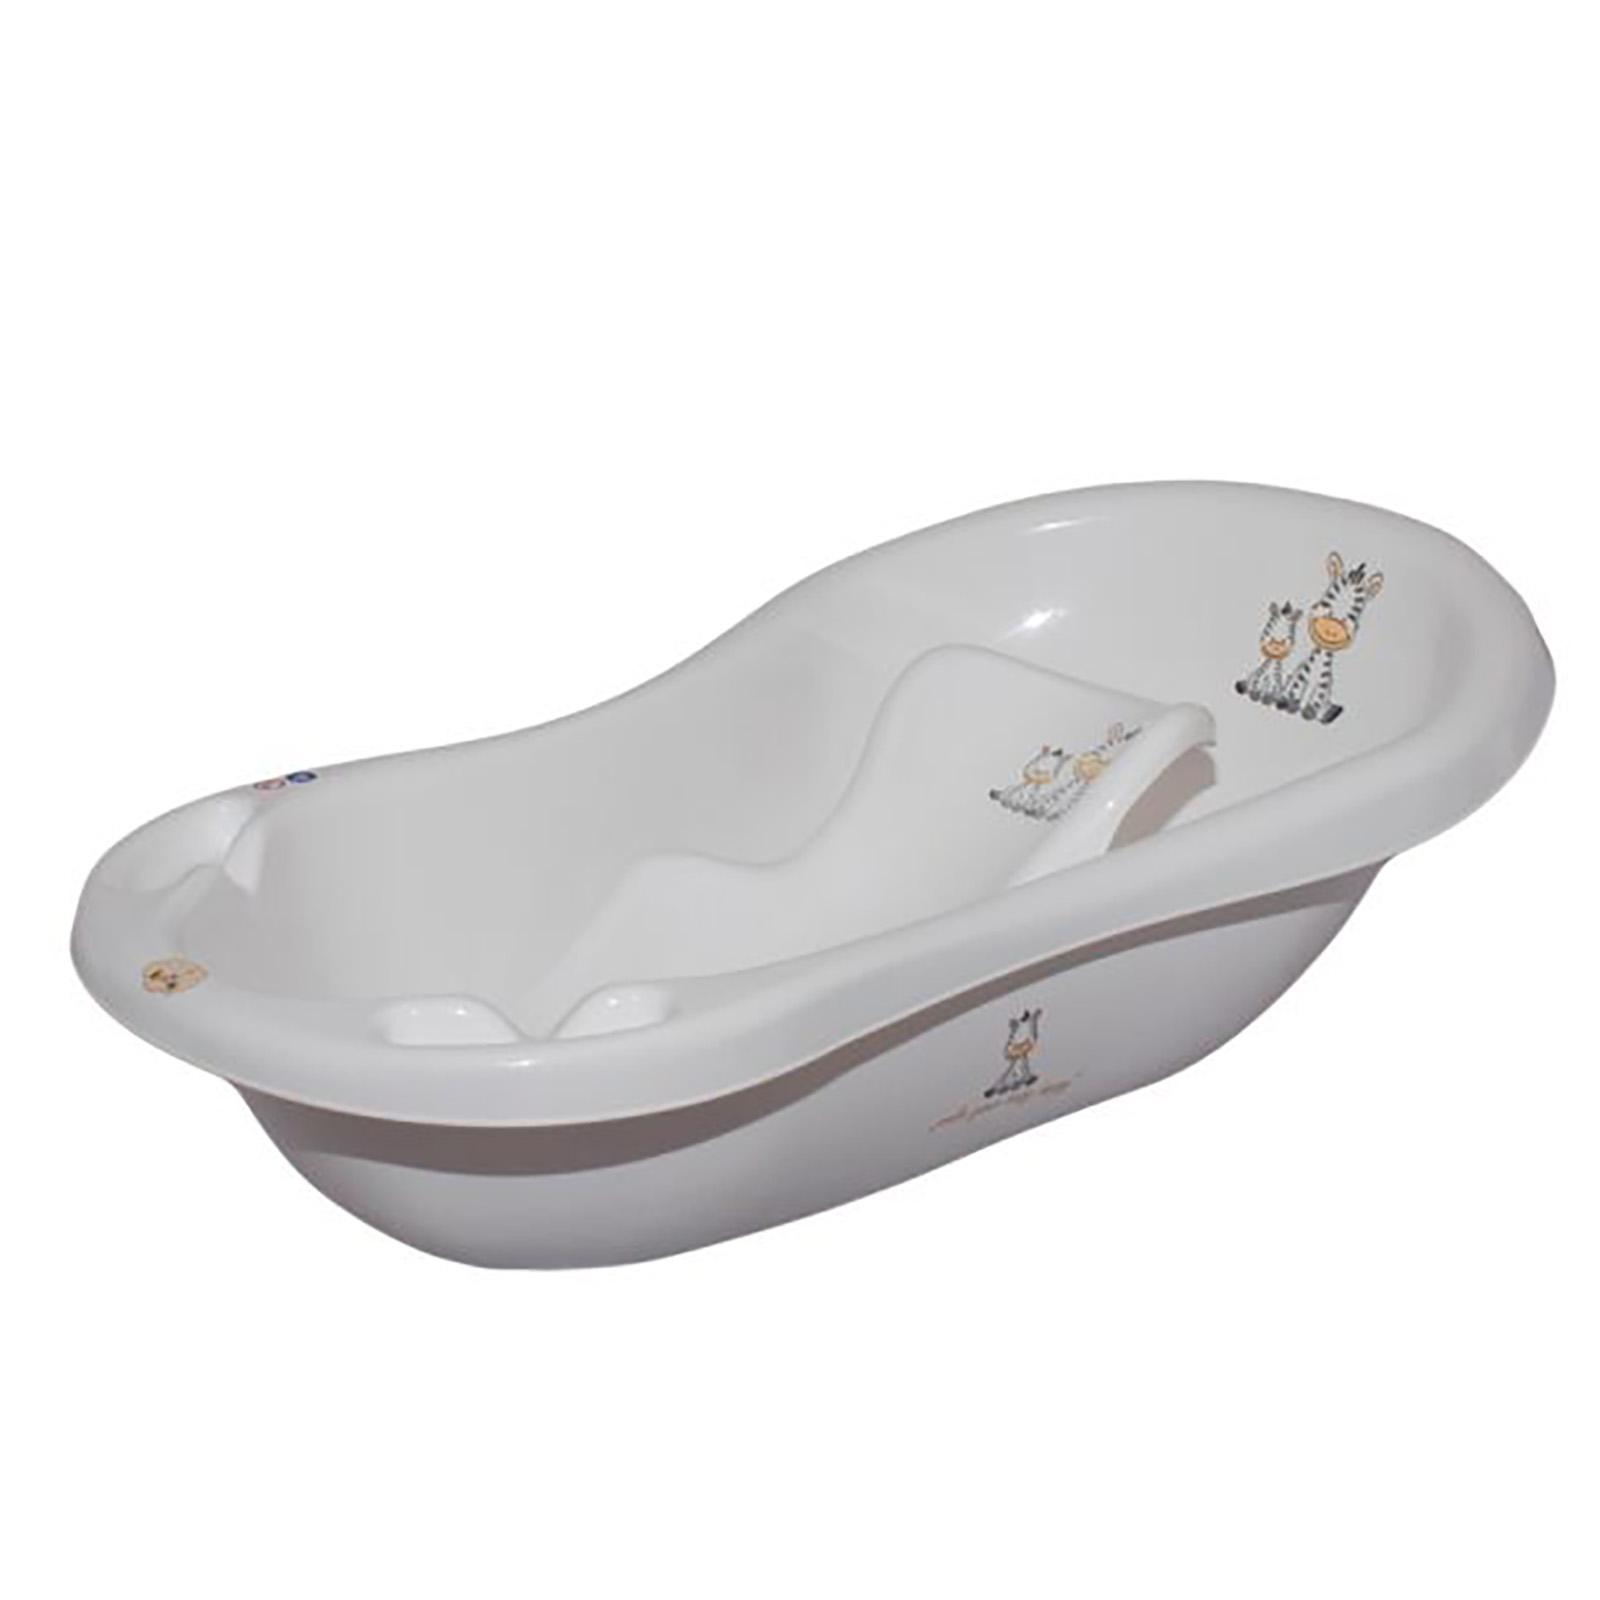 Maltex Baby Bath With Bath Seat - Zebra White | Buy at Online4baby